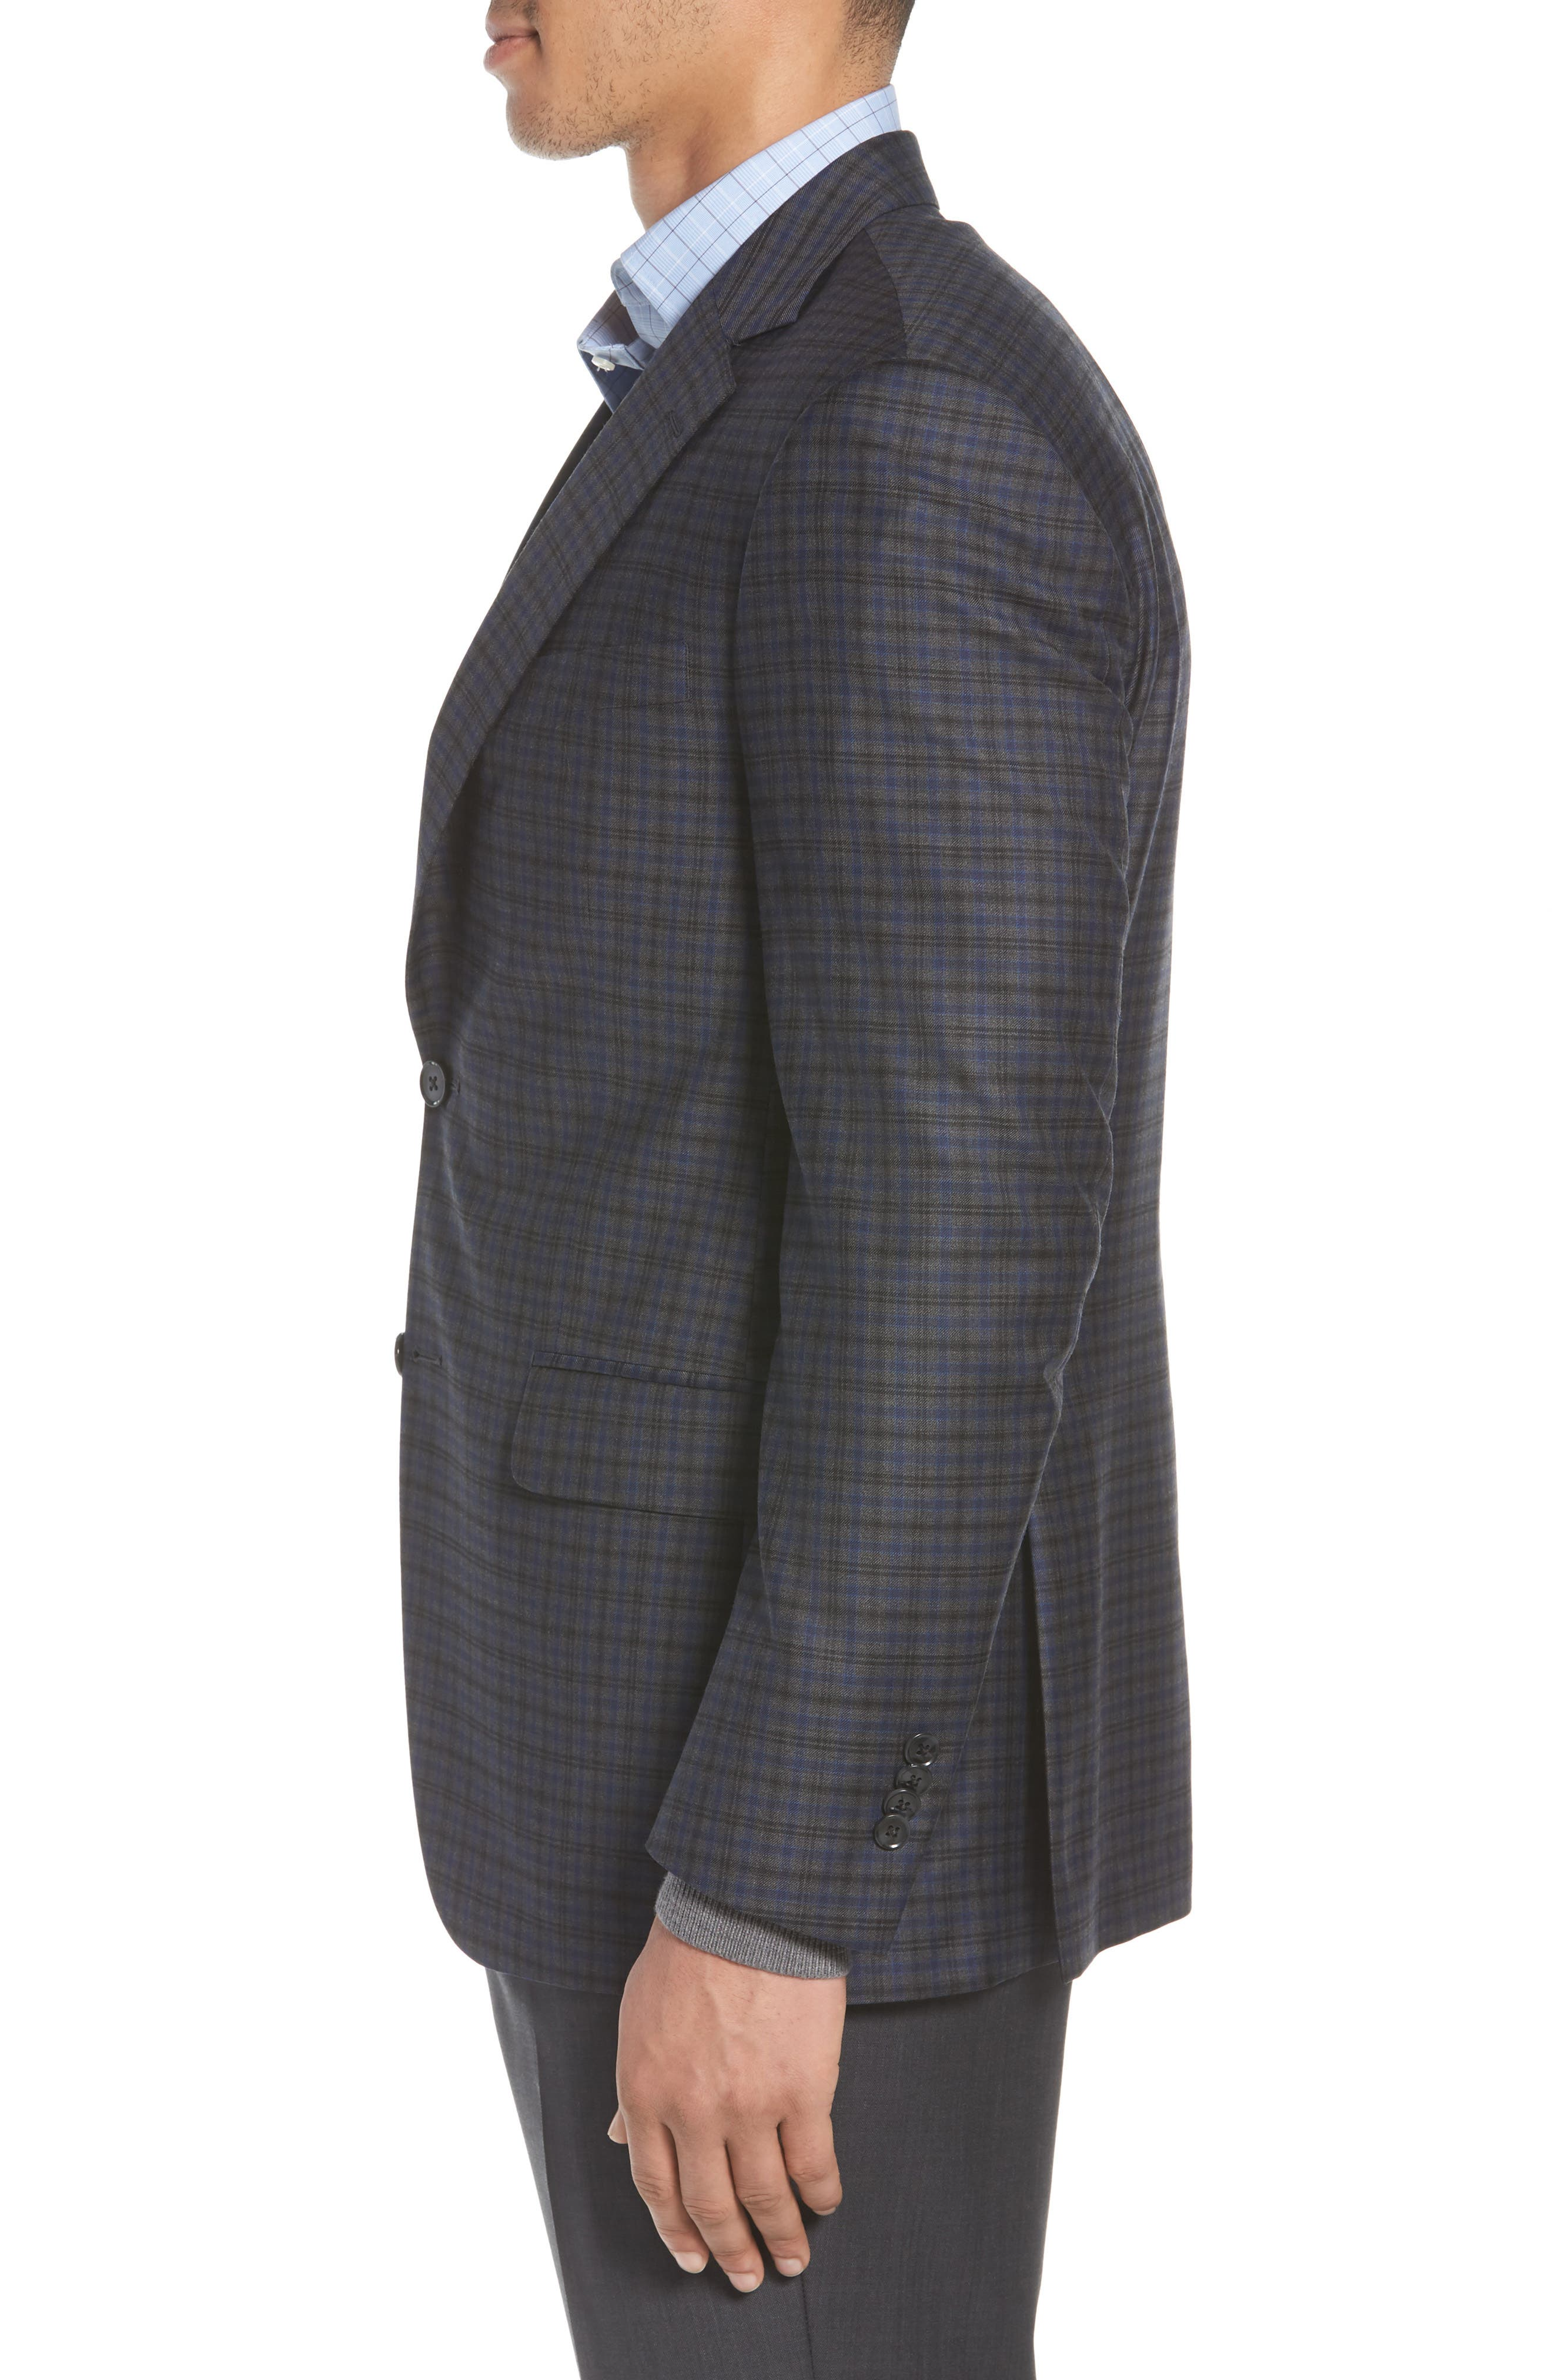 PETER MILLAR,                             Classic Fit Windowpane Check Wool Sport Coat,                             Alternate thumbnail 3, color,                             020